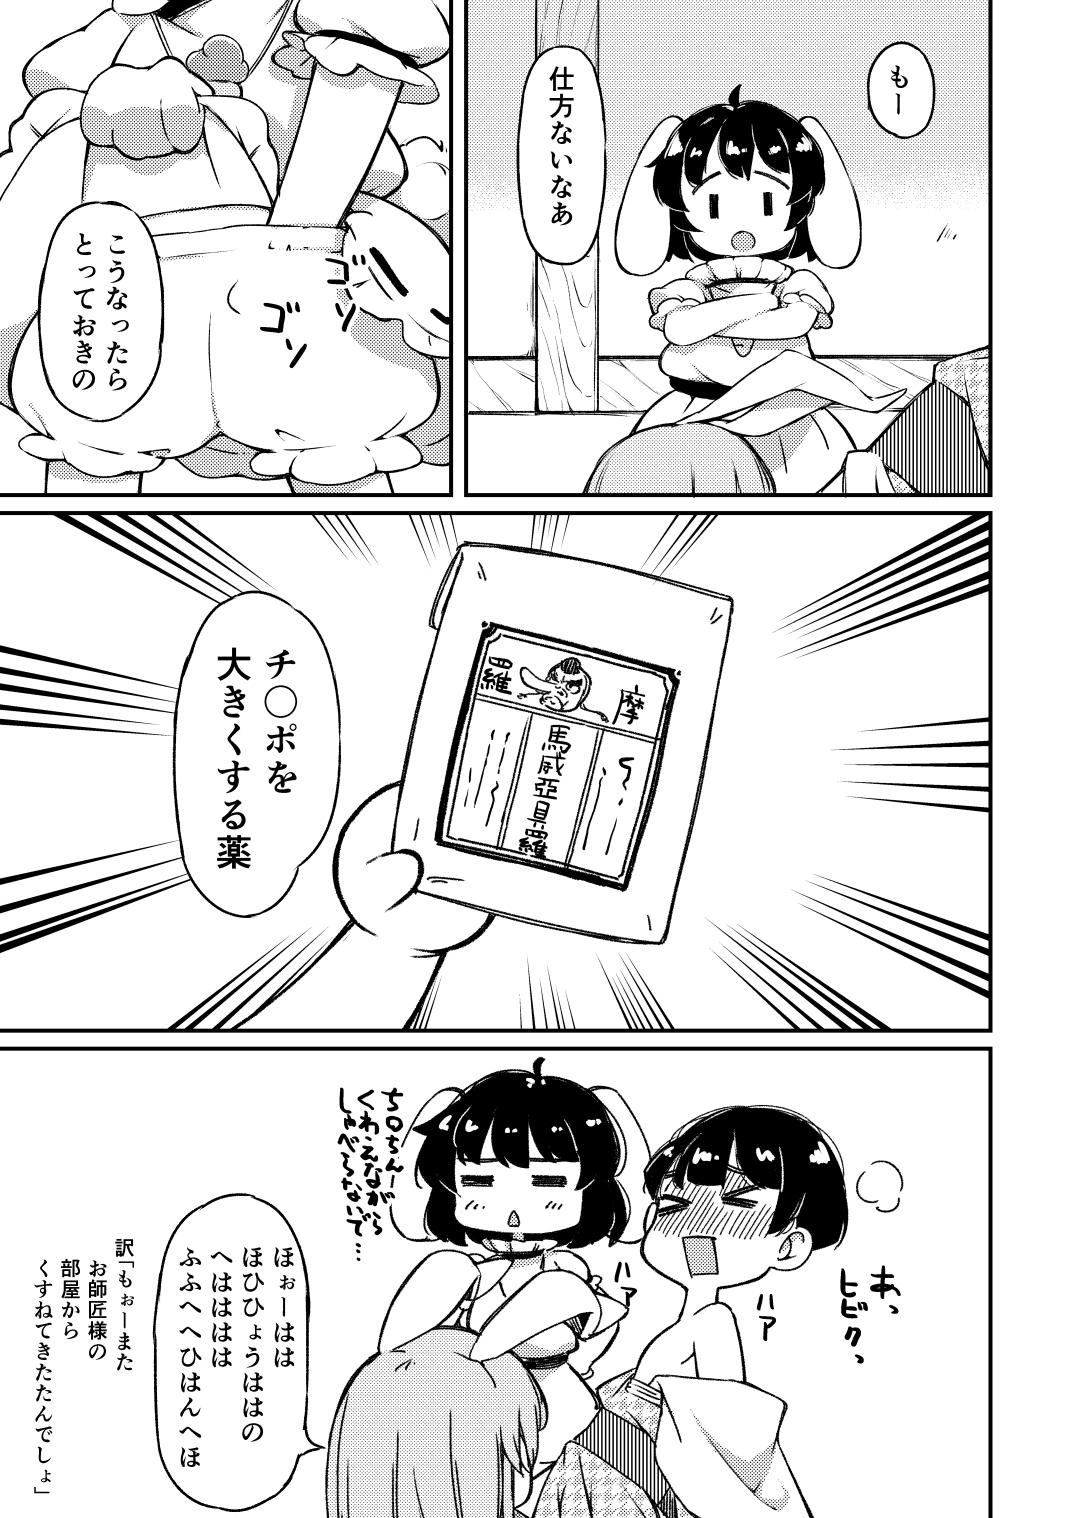 UdoTewi no, Gochisousama! 13